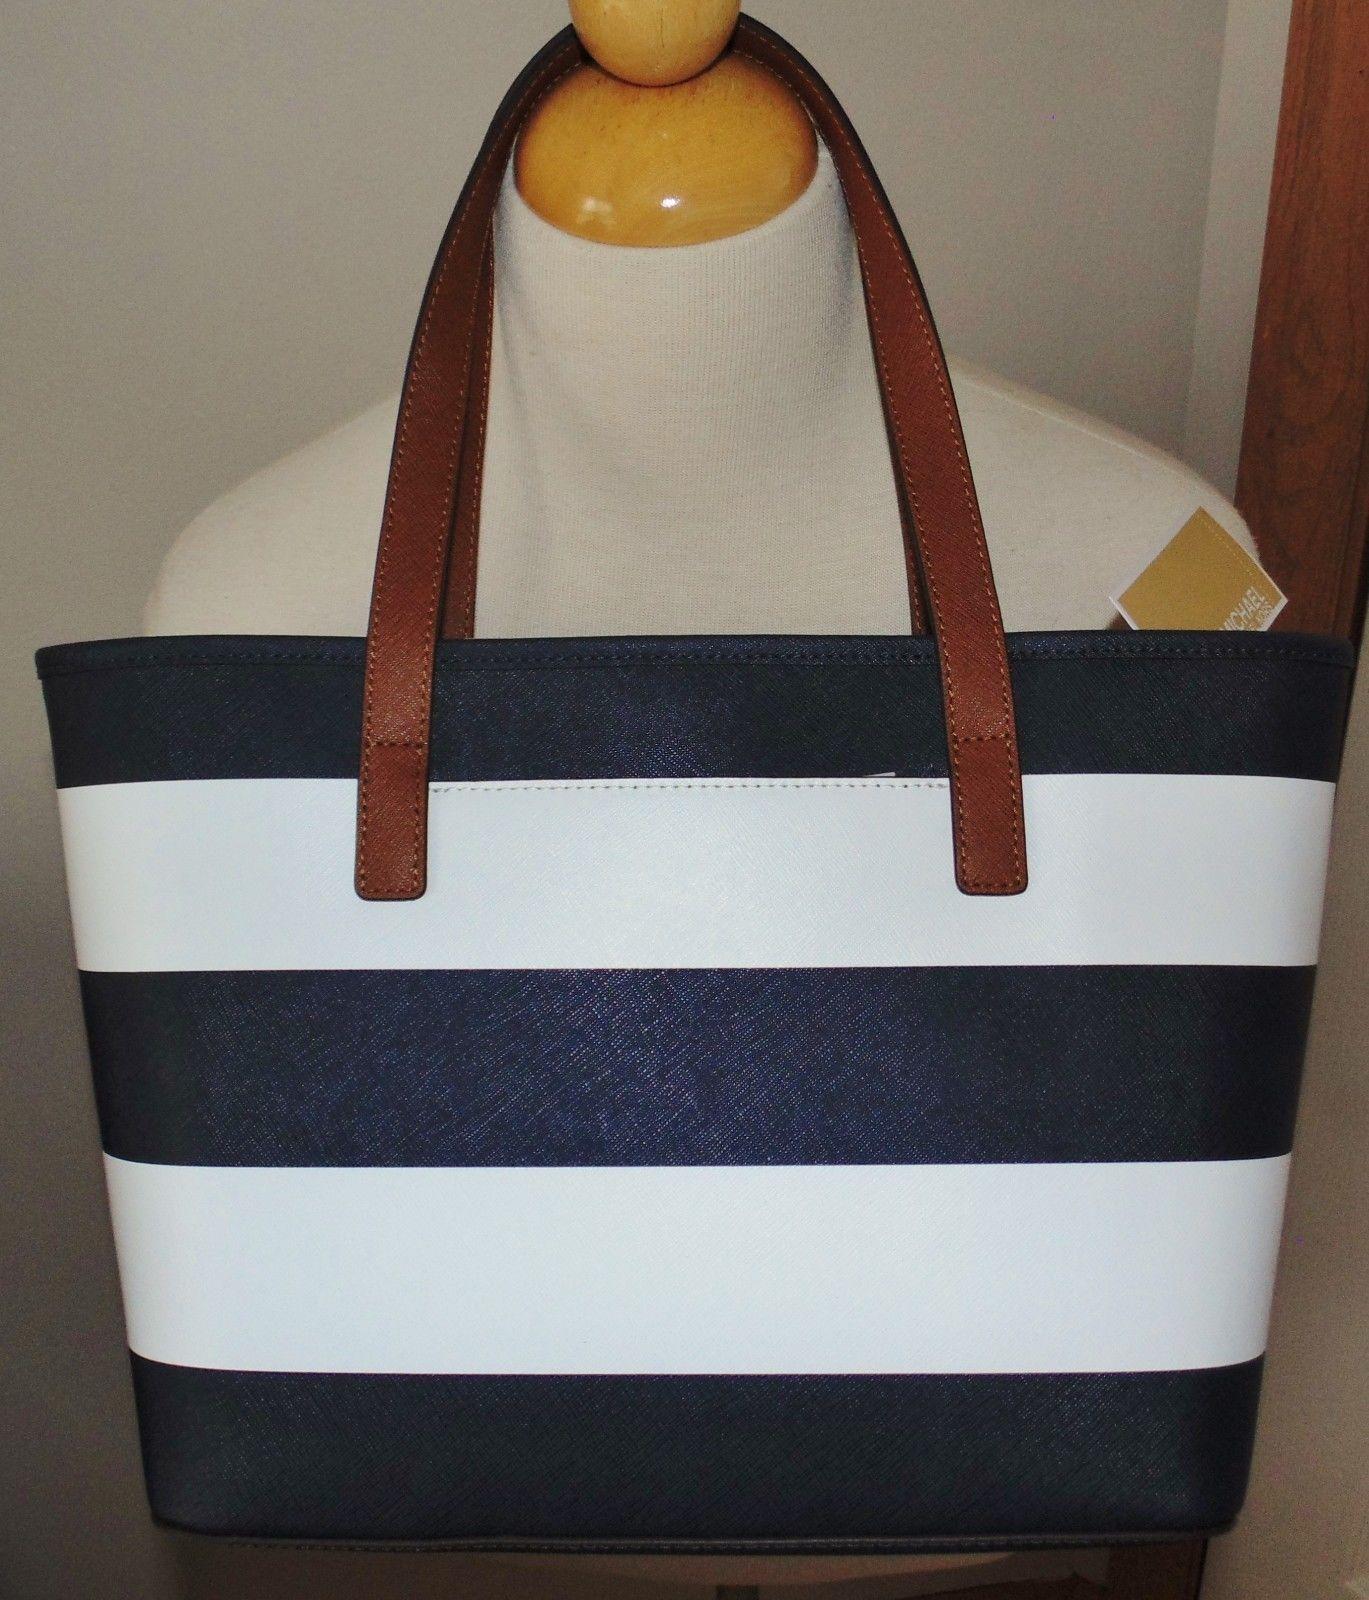 c8e9b504071 New MICHAEL KORS Jet Set navy white Travel Stripe Saffiano Leather TOTE bag   228  147.88